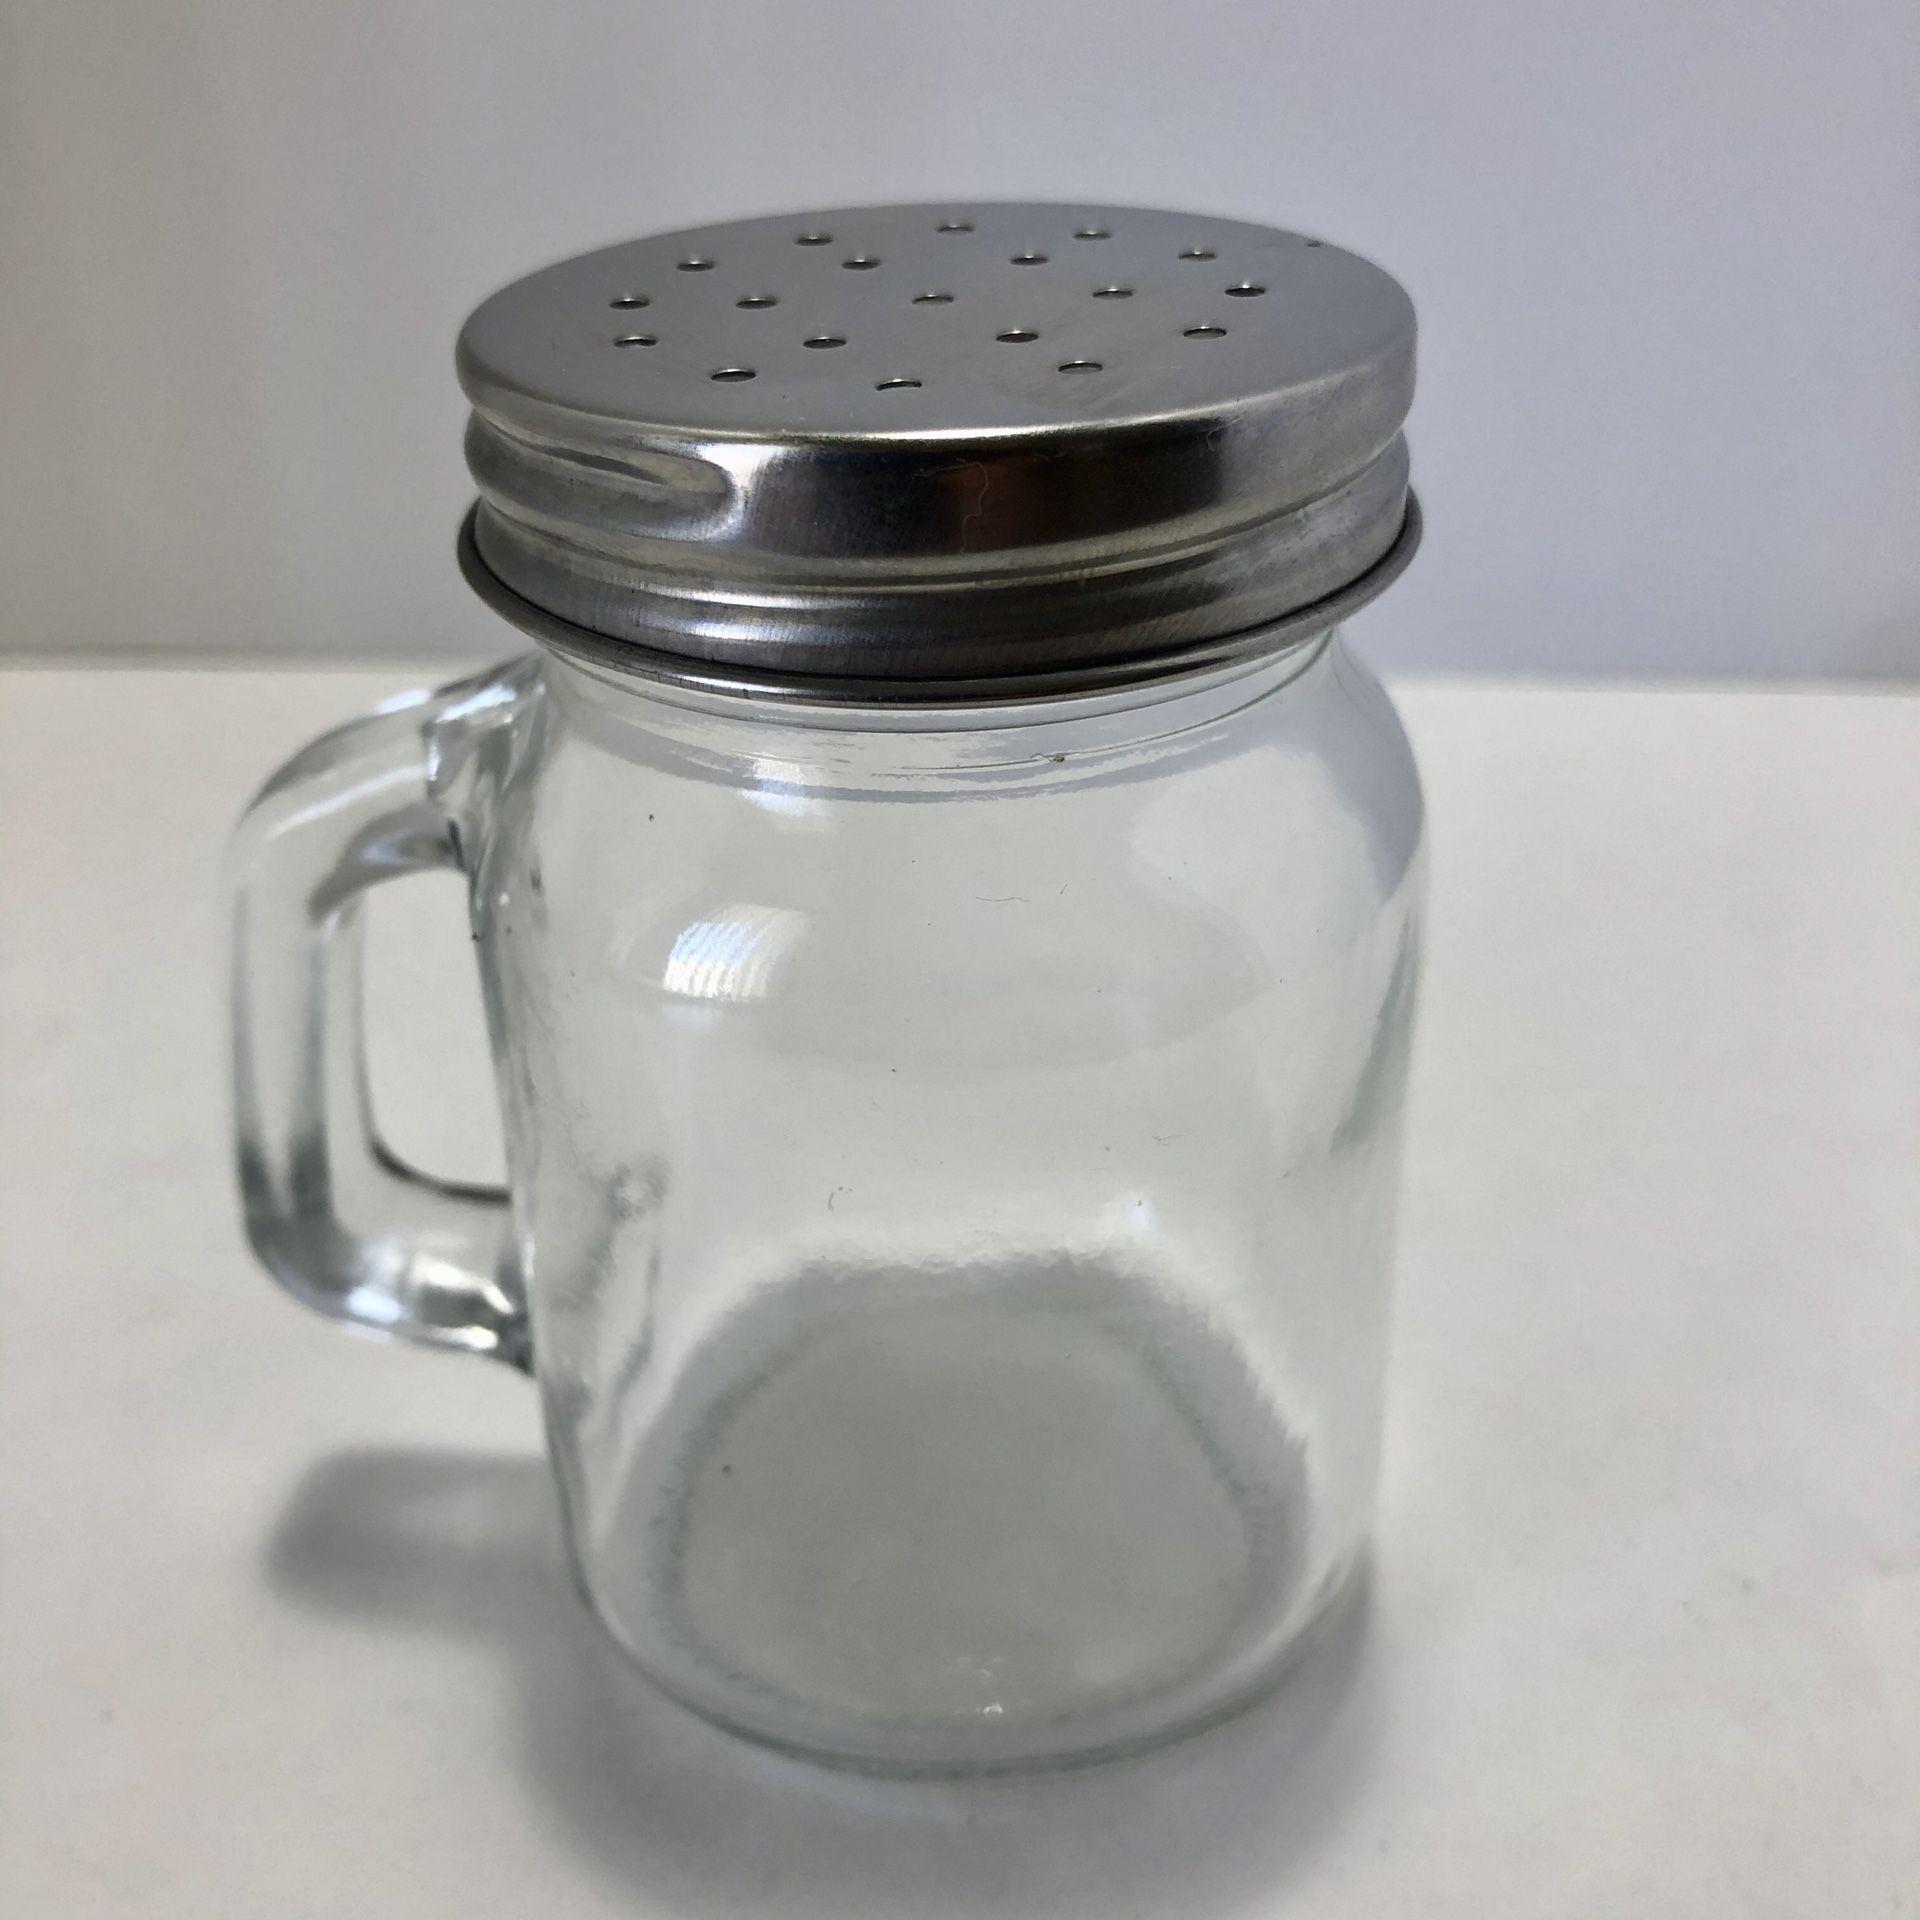 Salt Spice Shaker Mason Jar Stainless Steel Cap